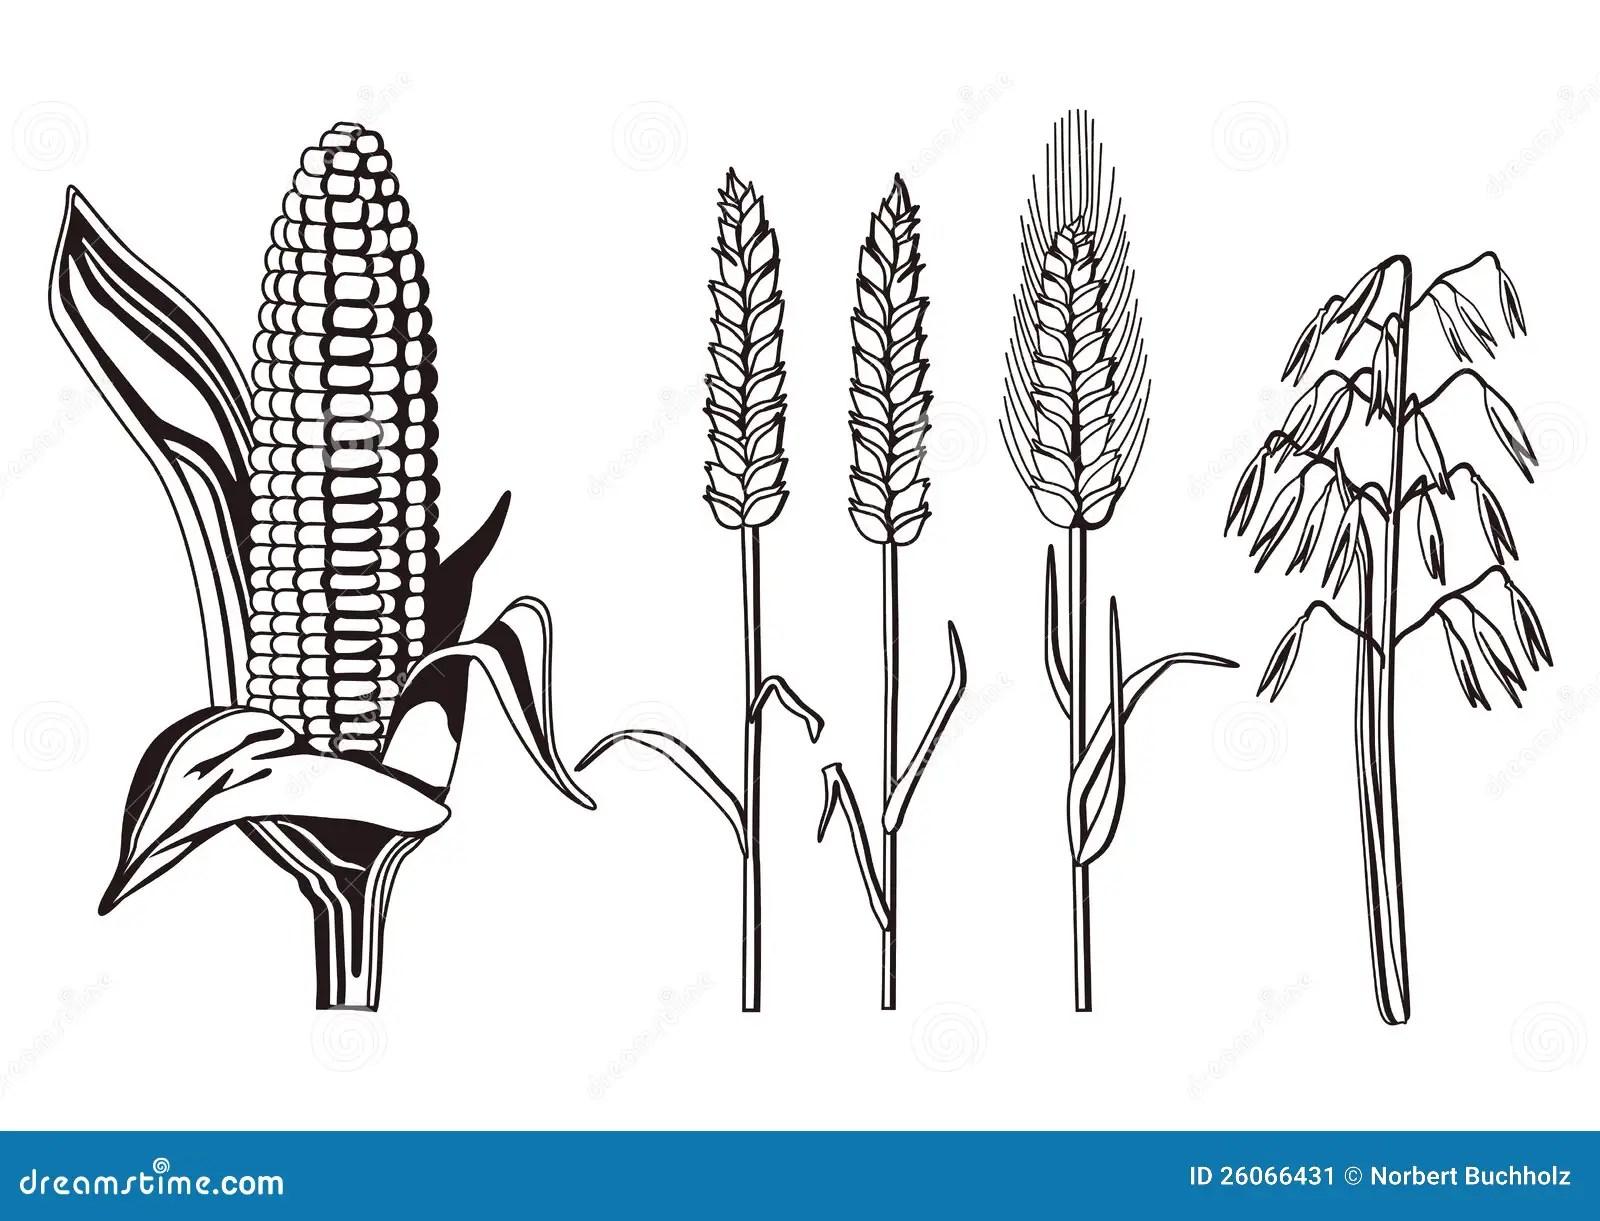 Cereals Illustration Stock Vector Illustration Of